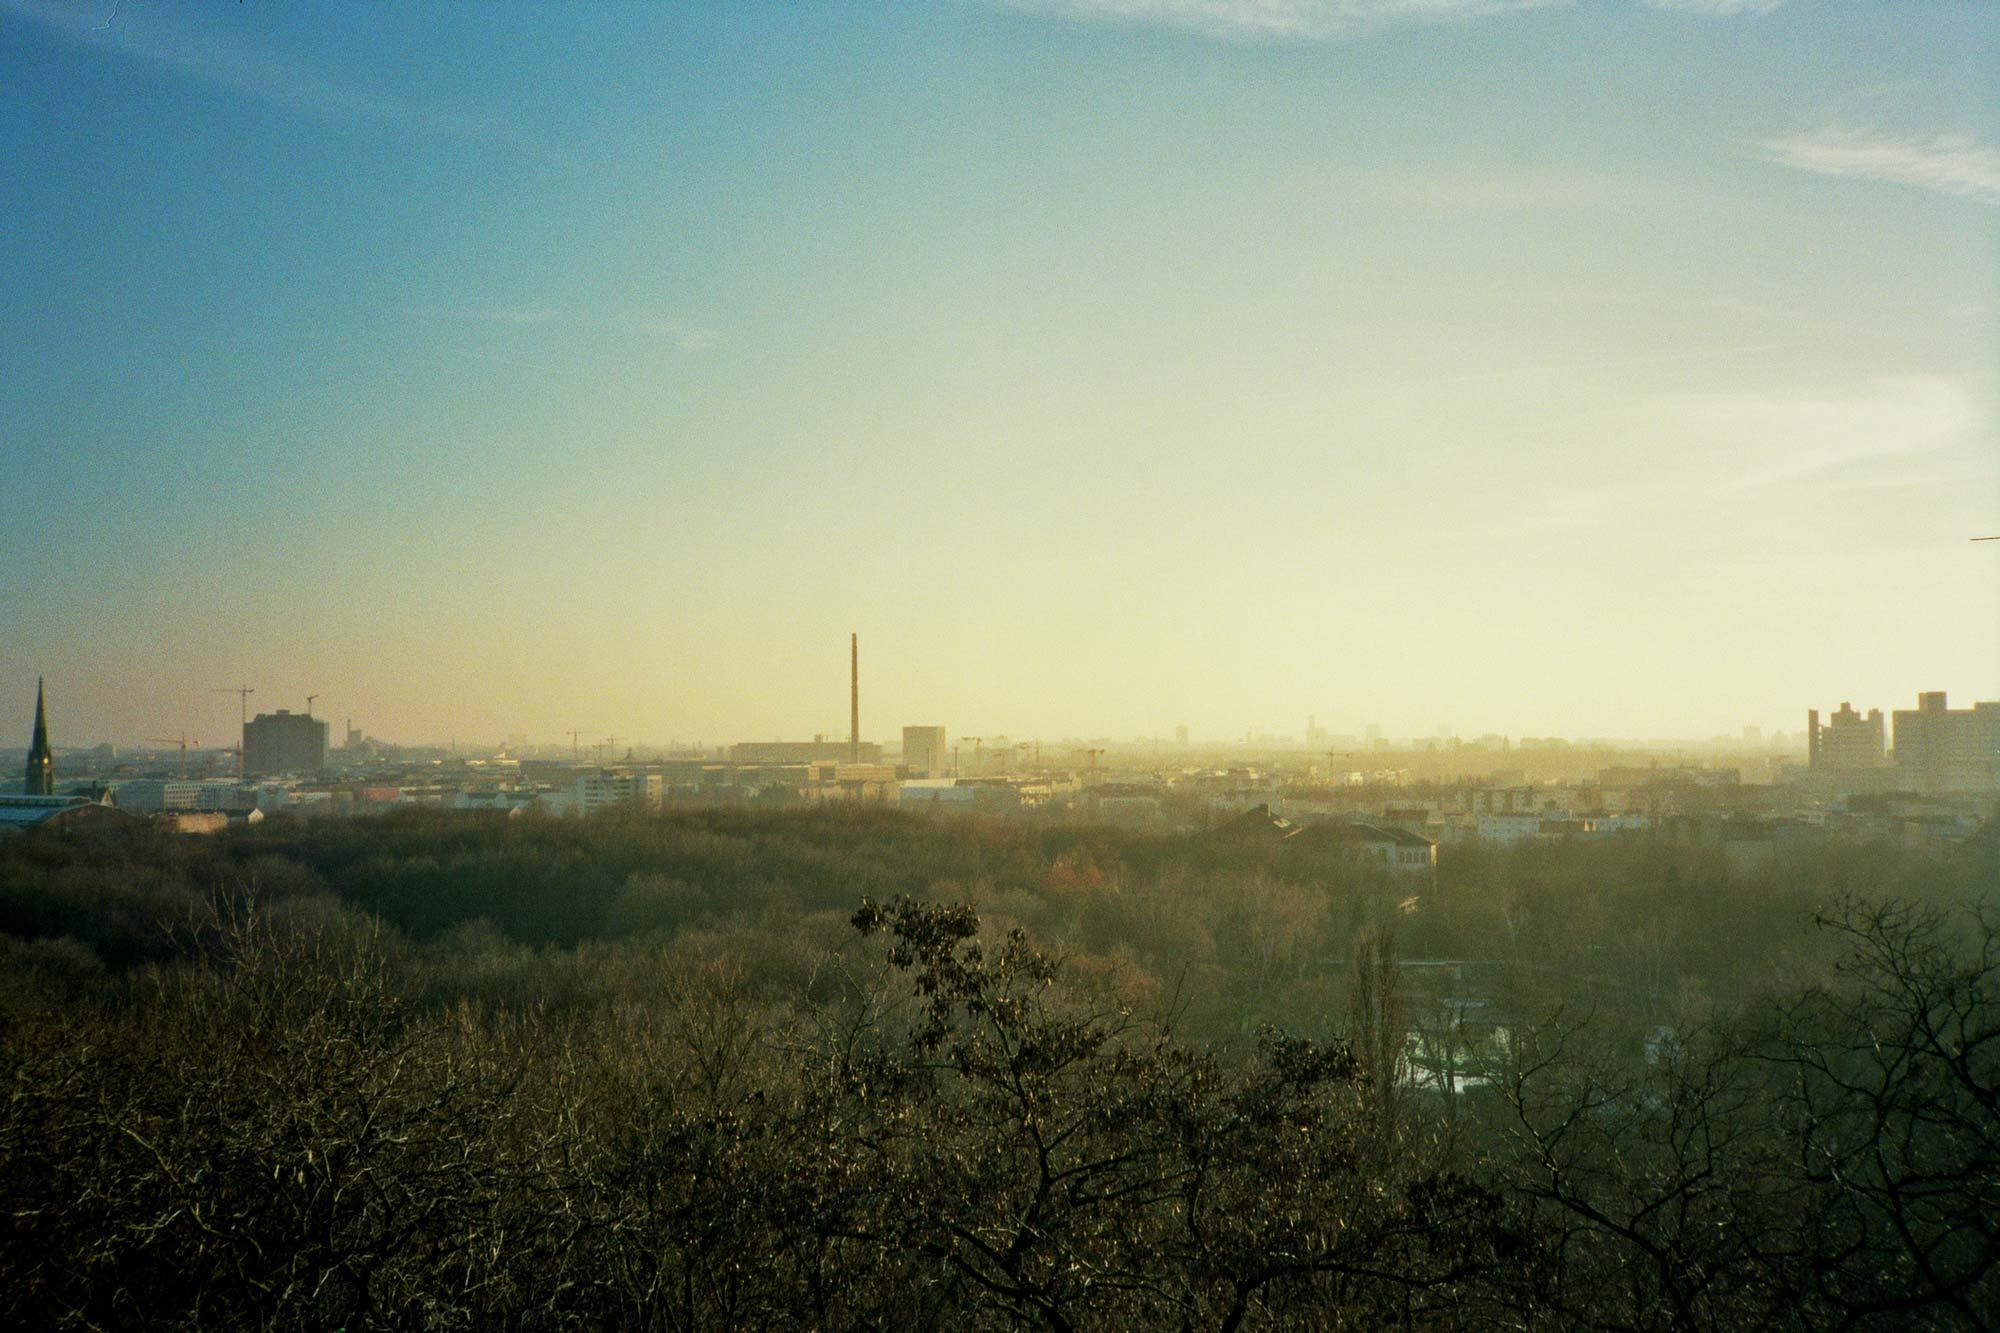 Berlin Hubholdthain park panorama